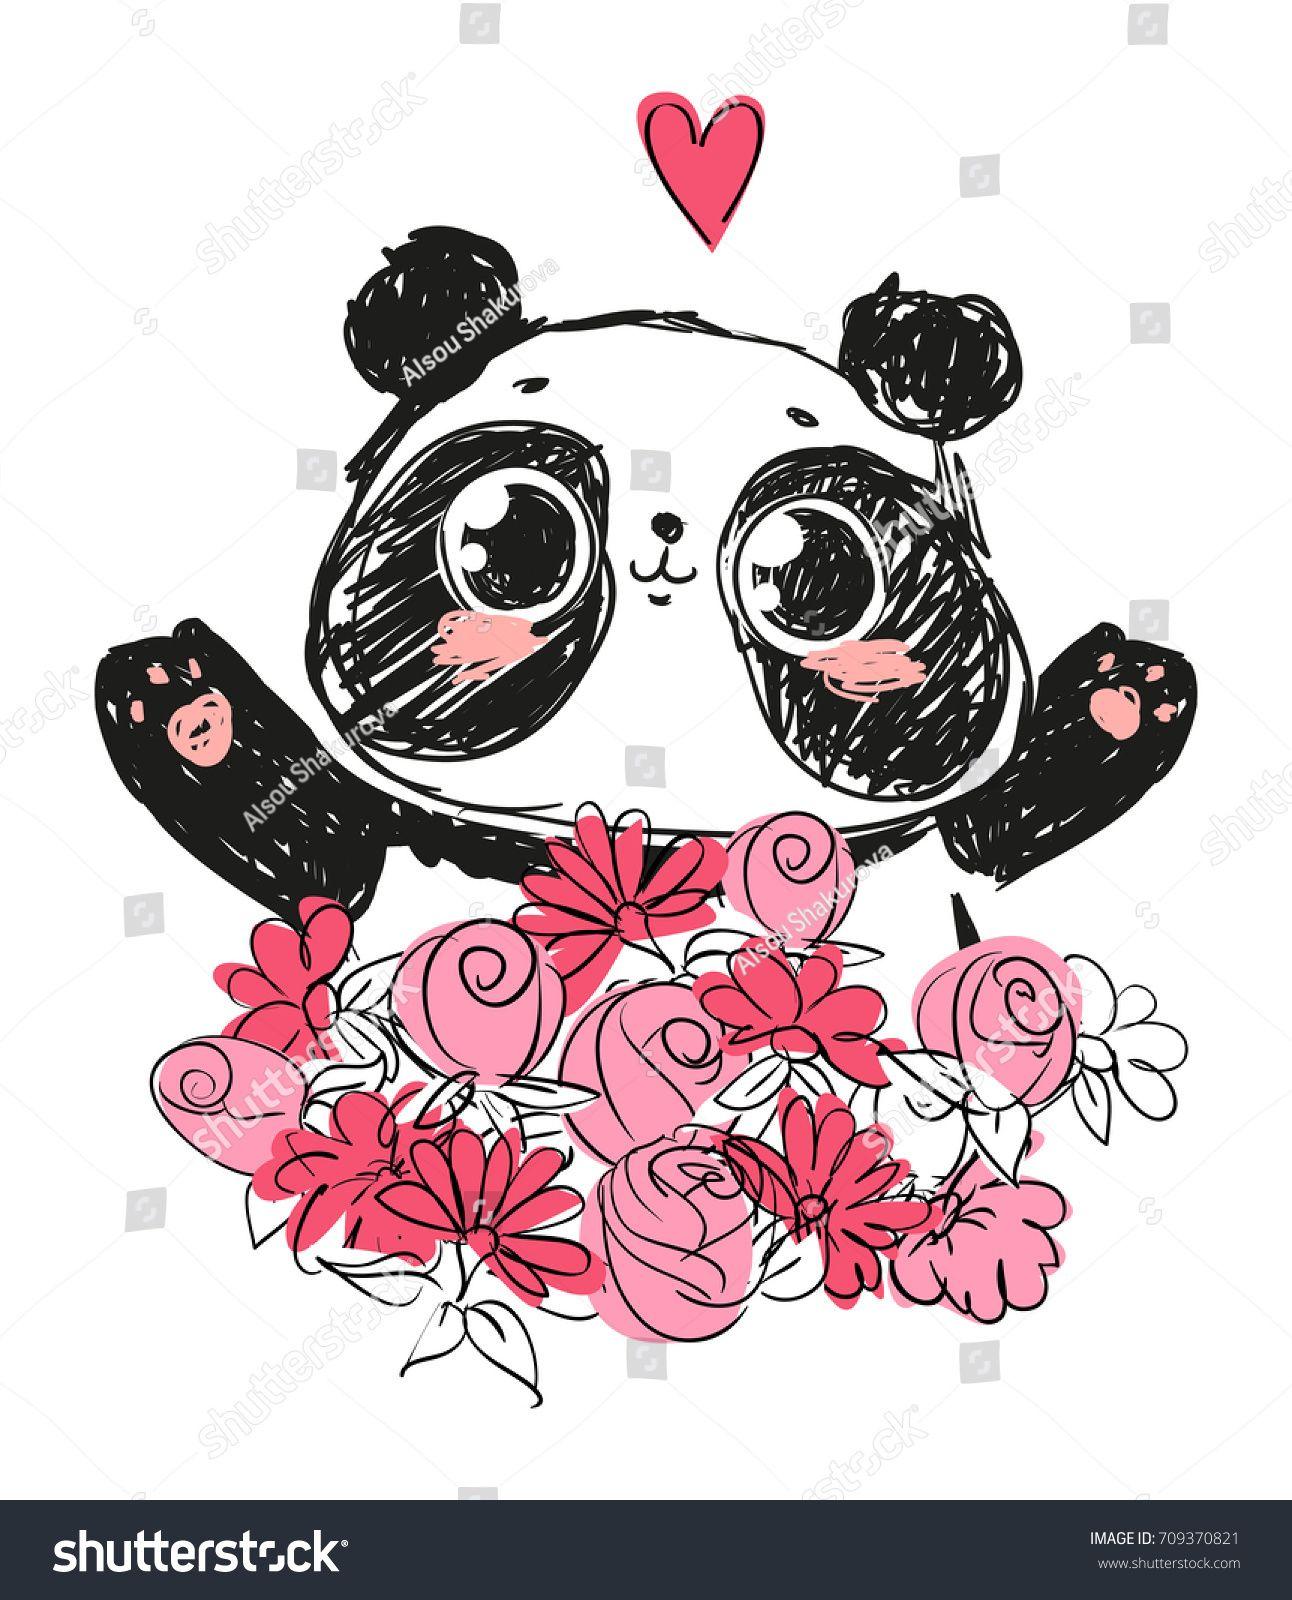 1292x1600 Cute Panda Bear, Vector Illustration. Animal Vector. Panda With